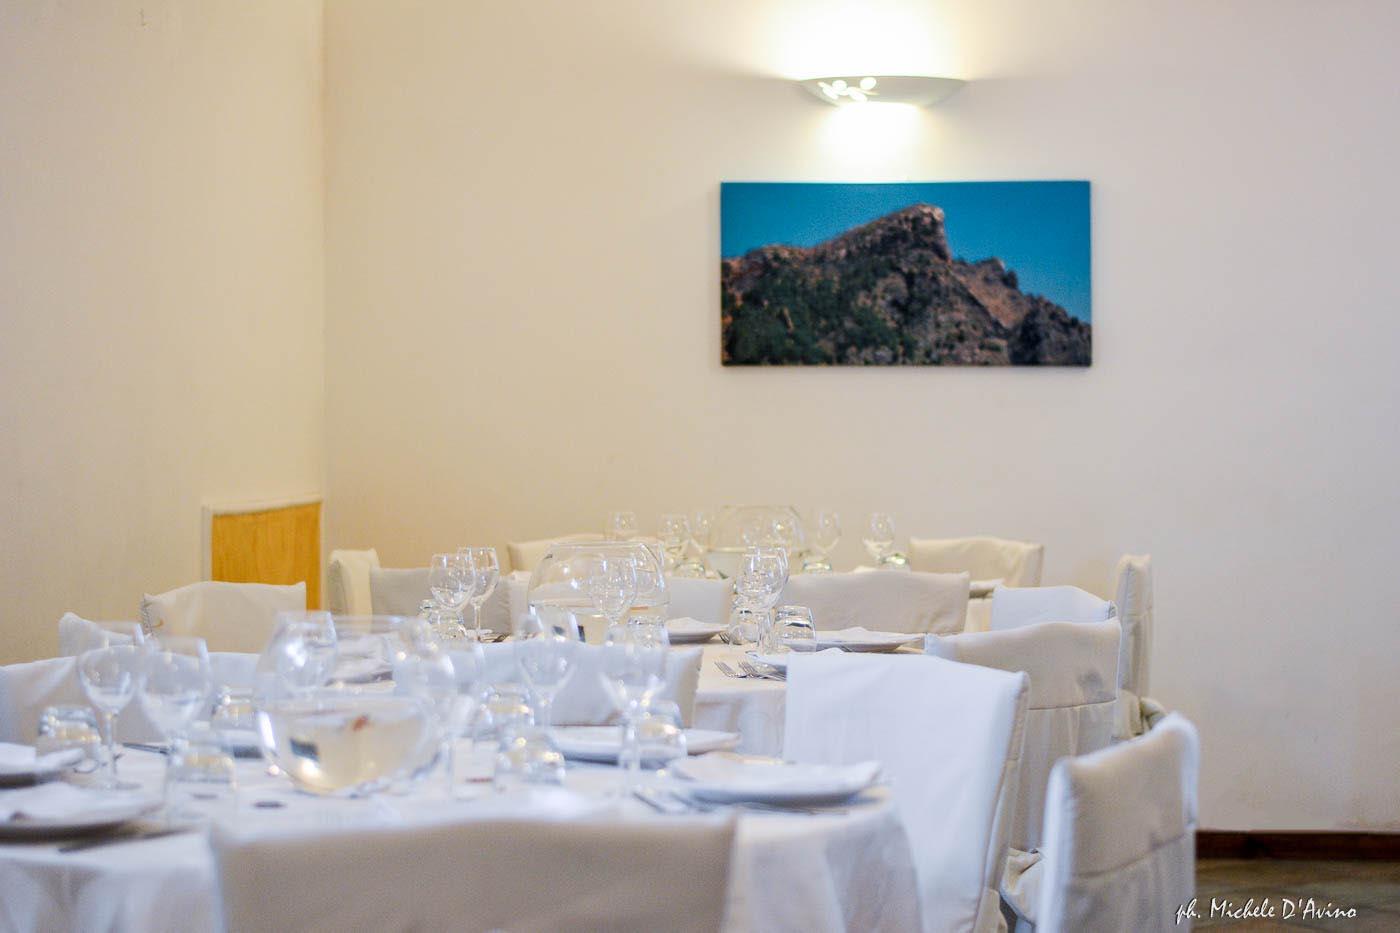 tenuta-san-sossio-baccala-food-experience--20